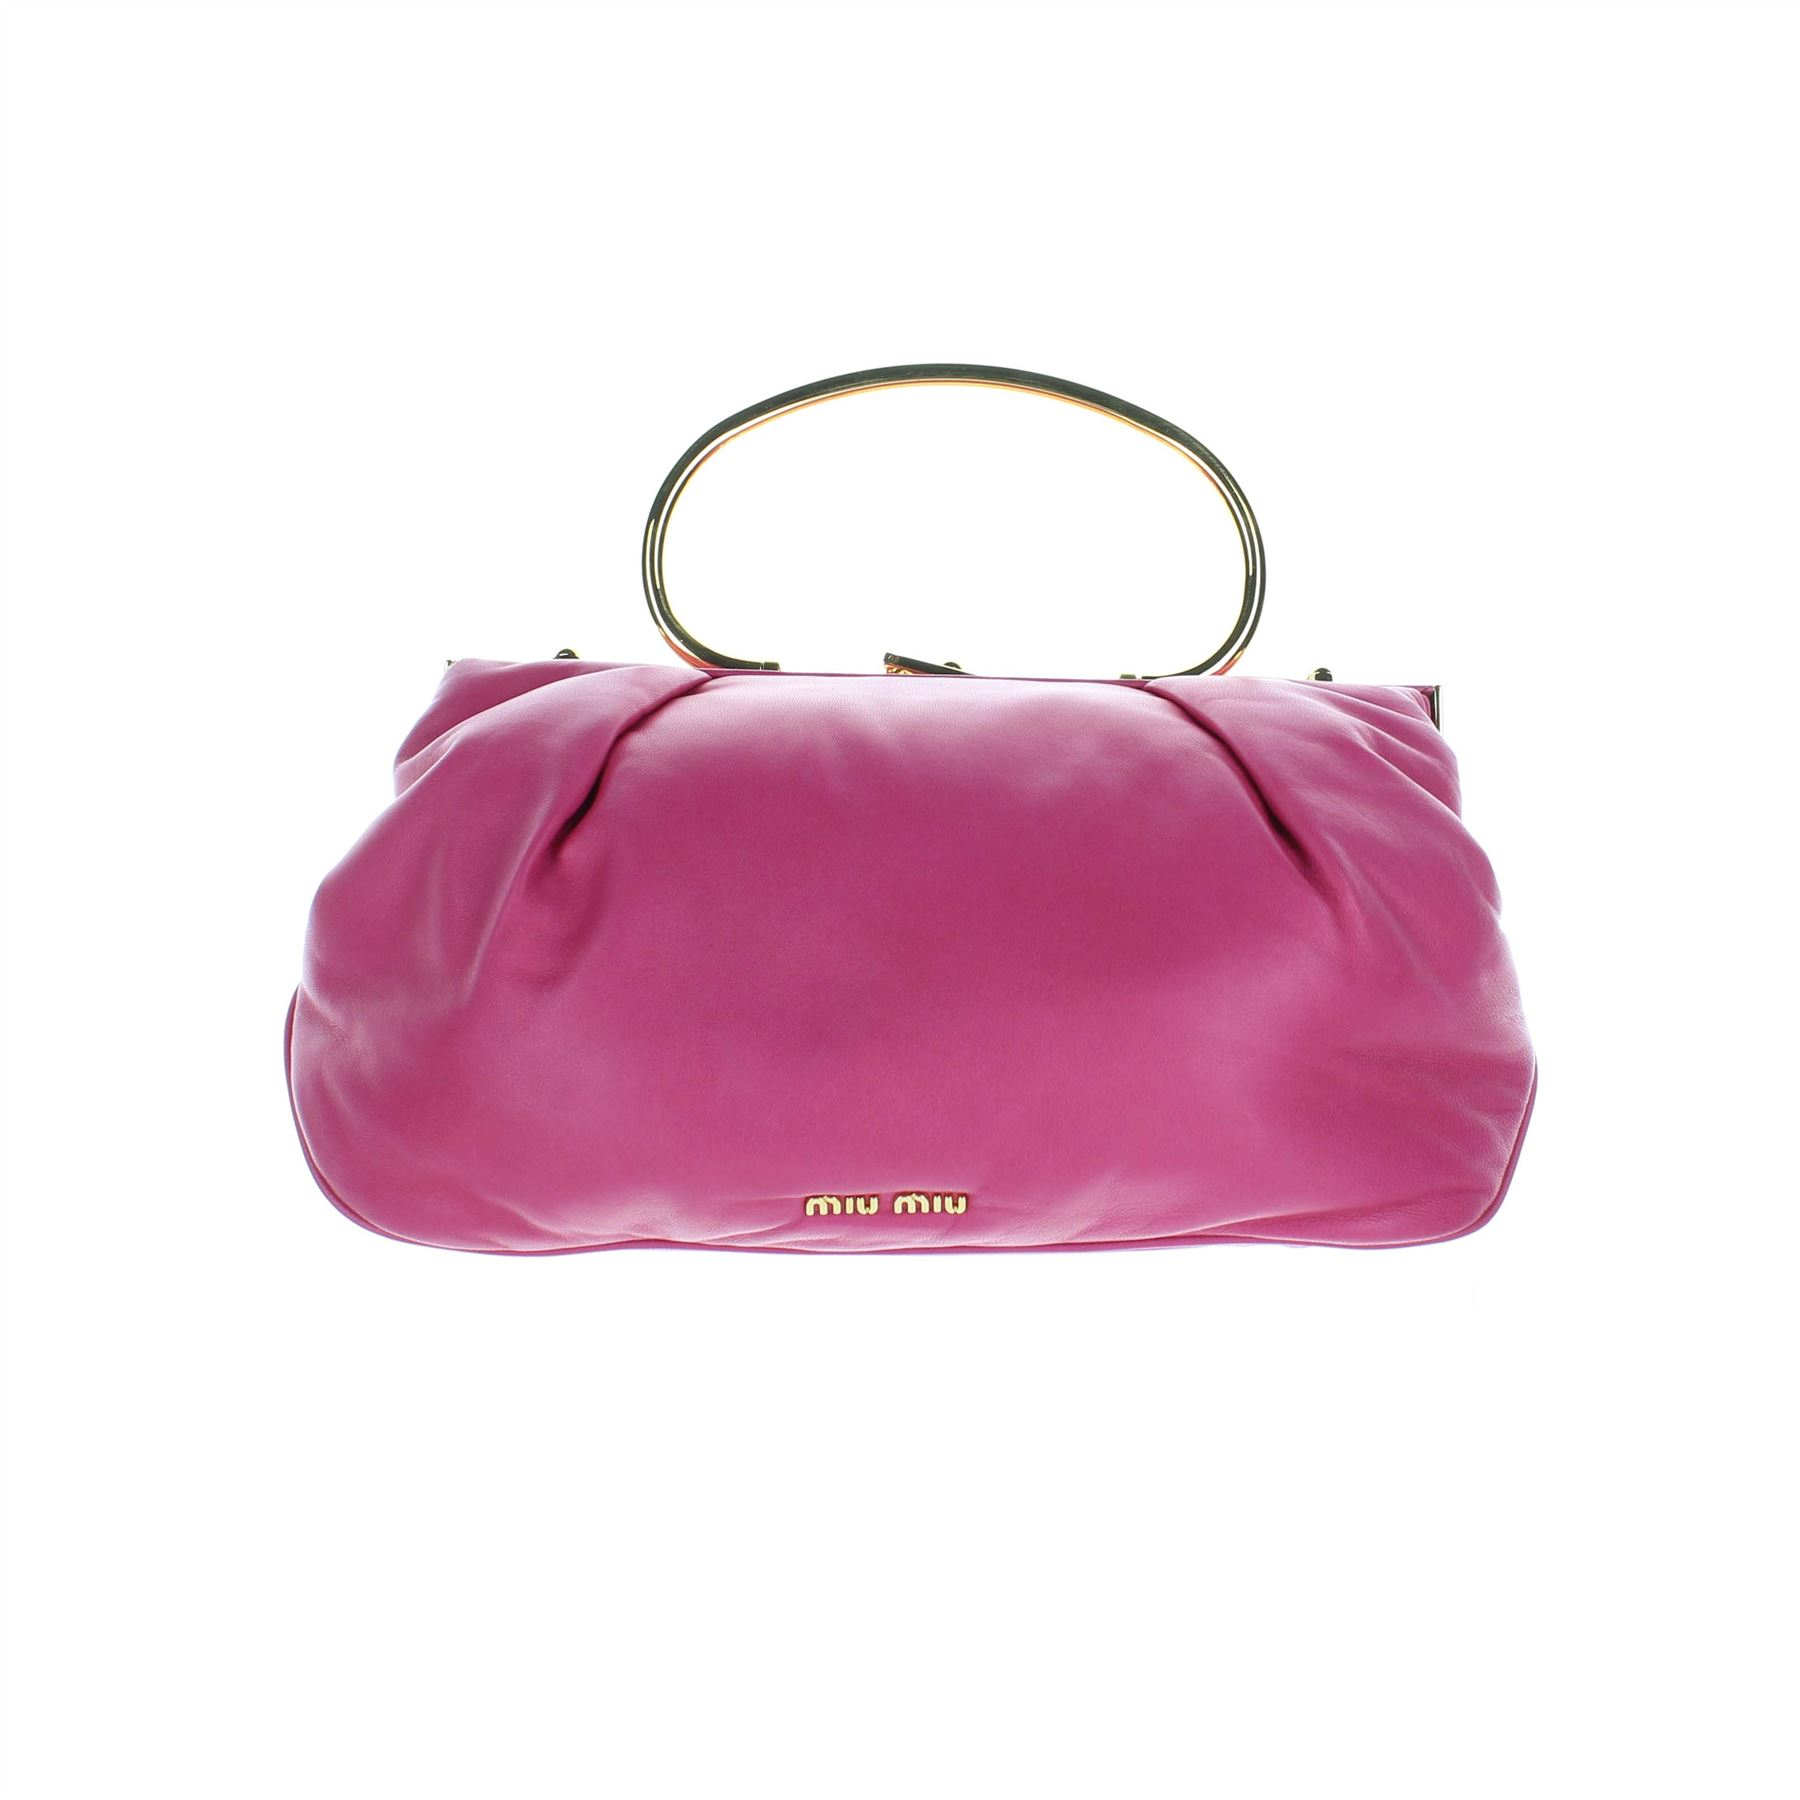 6d1f188ccbe5 ... MIU-MIU-Pink-Leather-Handle-Bag-7-034-